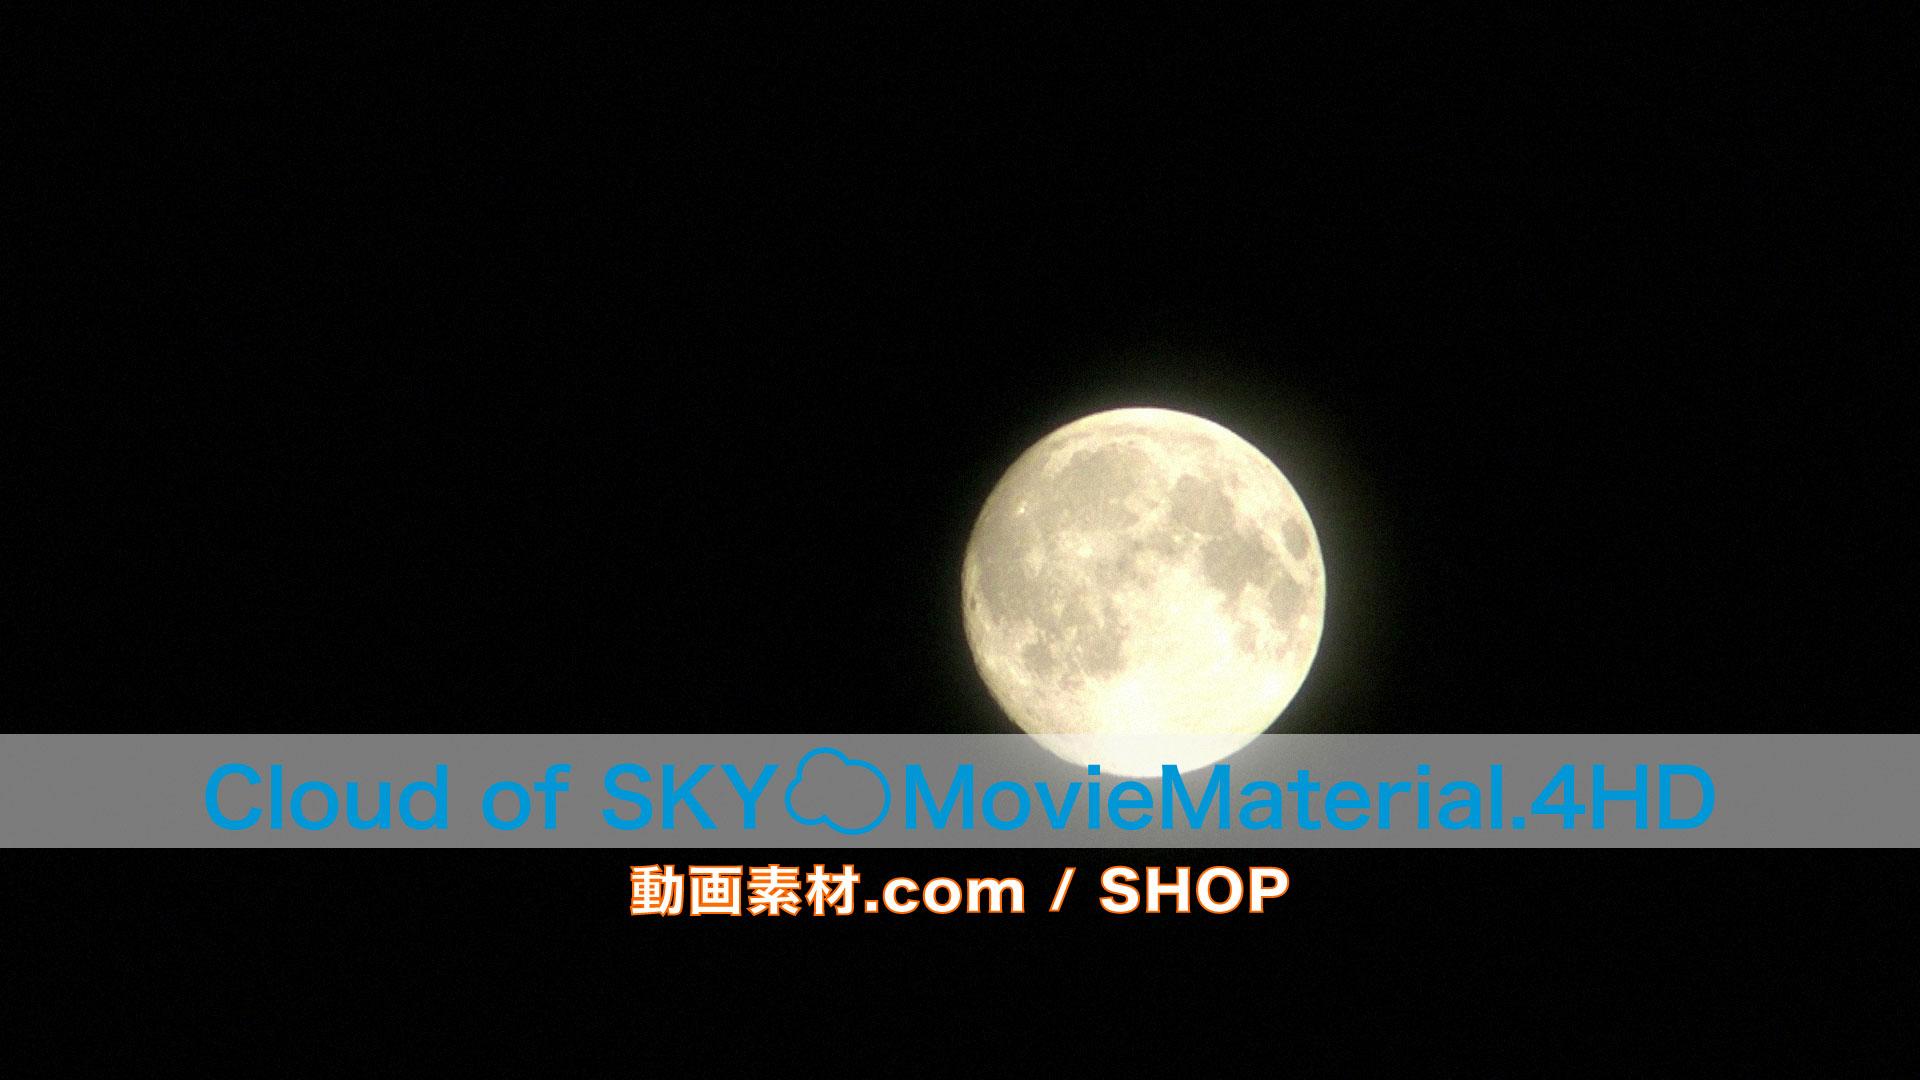 Cloud of SKY MovieMaterial.4HD 空と雲フルハイビジョン1920×1080p映像素材集image5